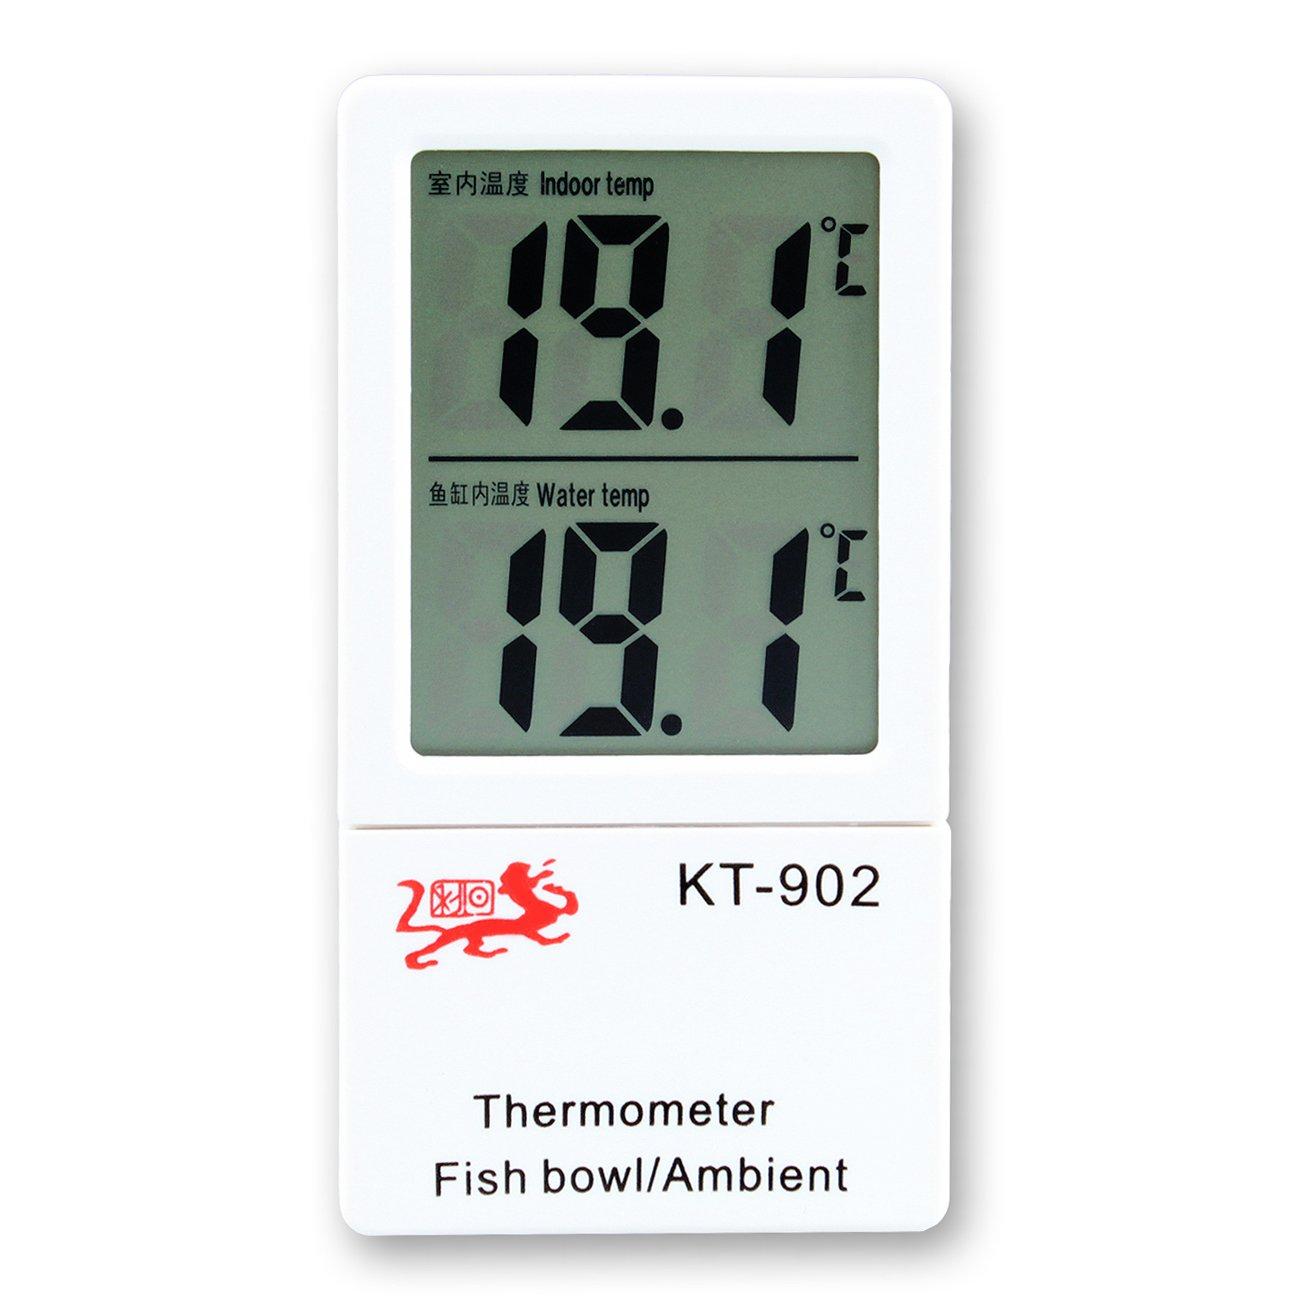 Tera Fishbowl Fish Tank Aquarium and Ambient Indoor Temperature Dual Digital LCD Thermometer